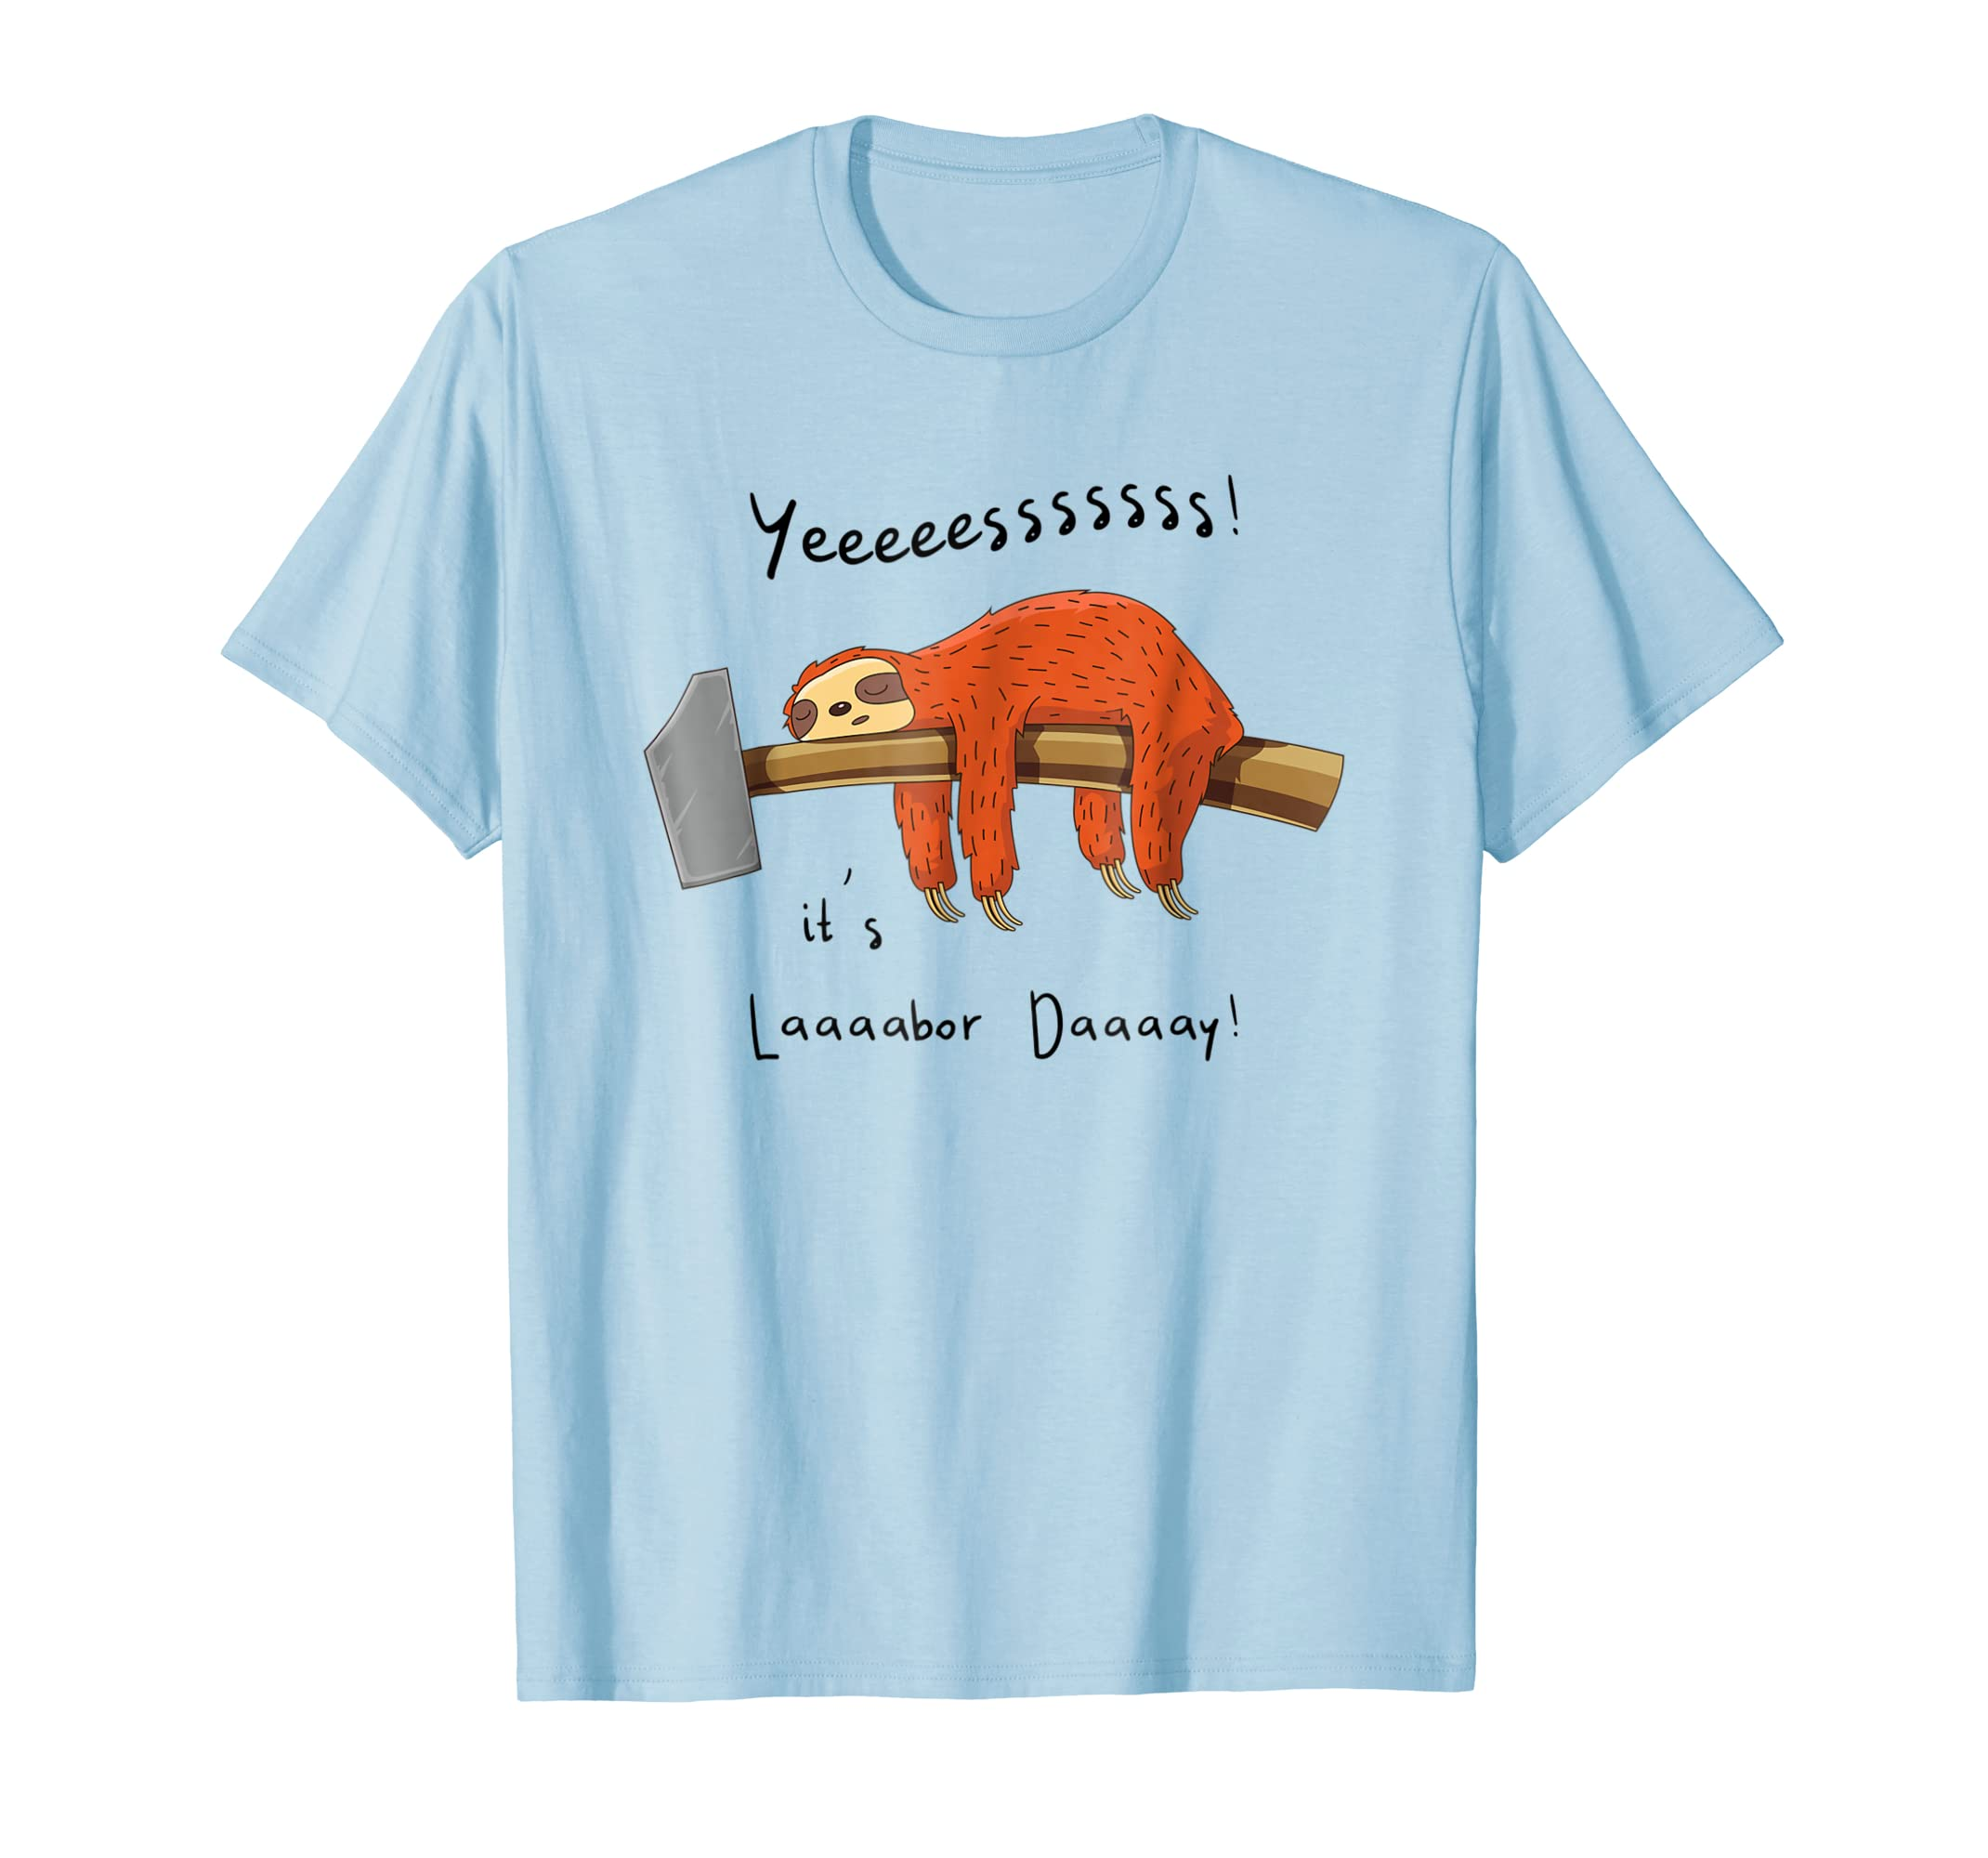 Labor Day Sloth Lover Funny Women Men Boys Girls T-Shirt-anz